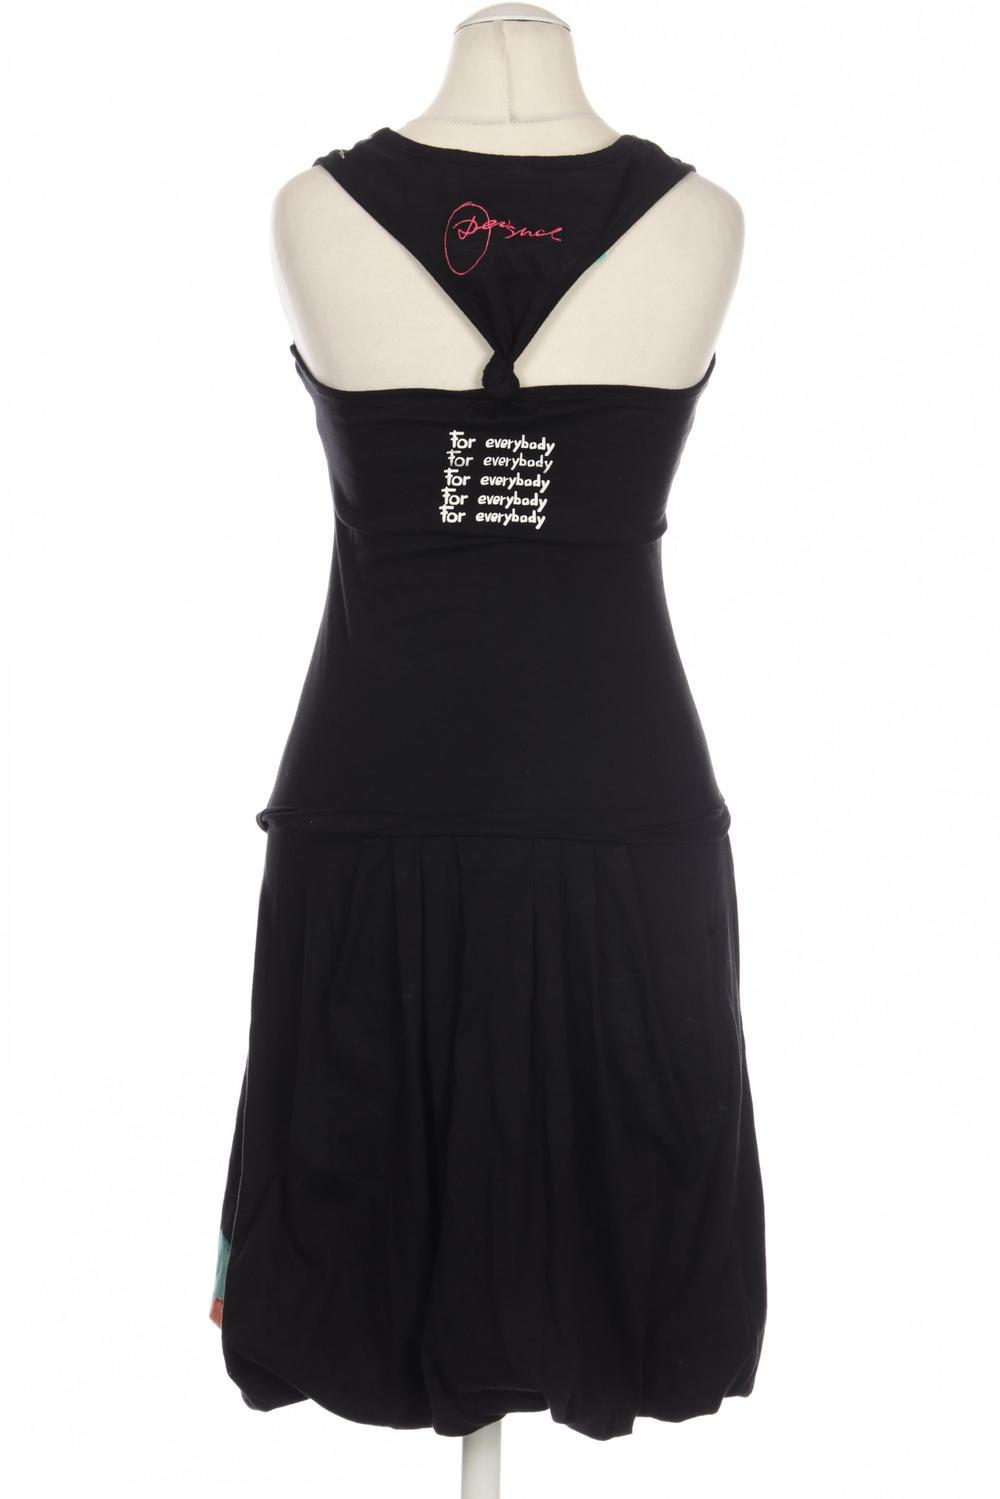 Desigual Damen Kleid INT XS Second Hand kaufen 4d1QP